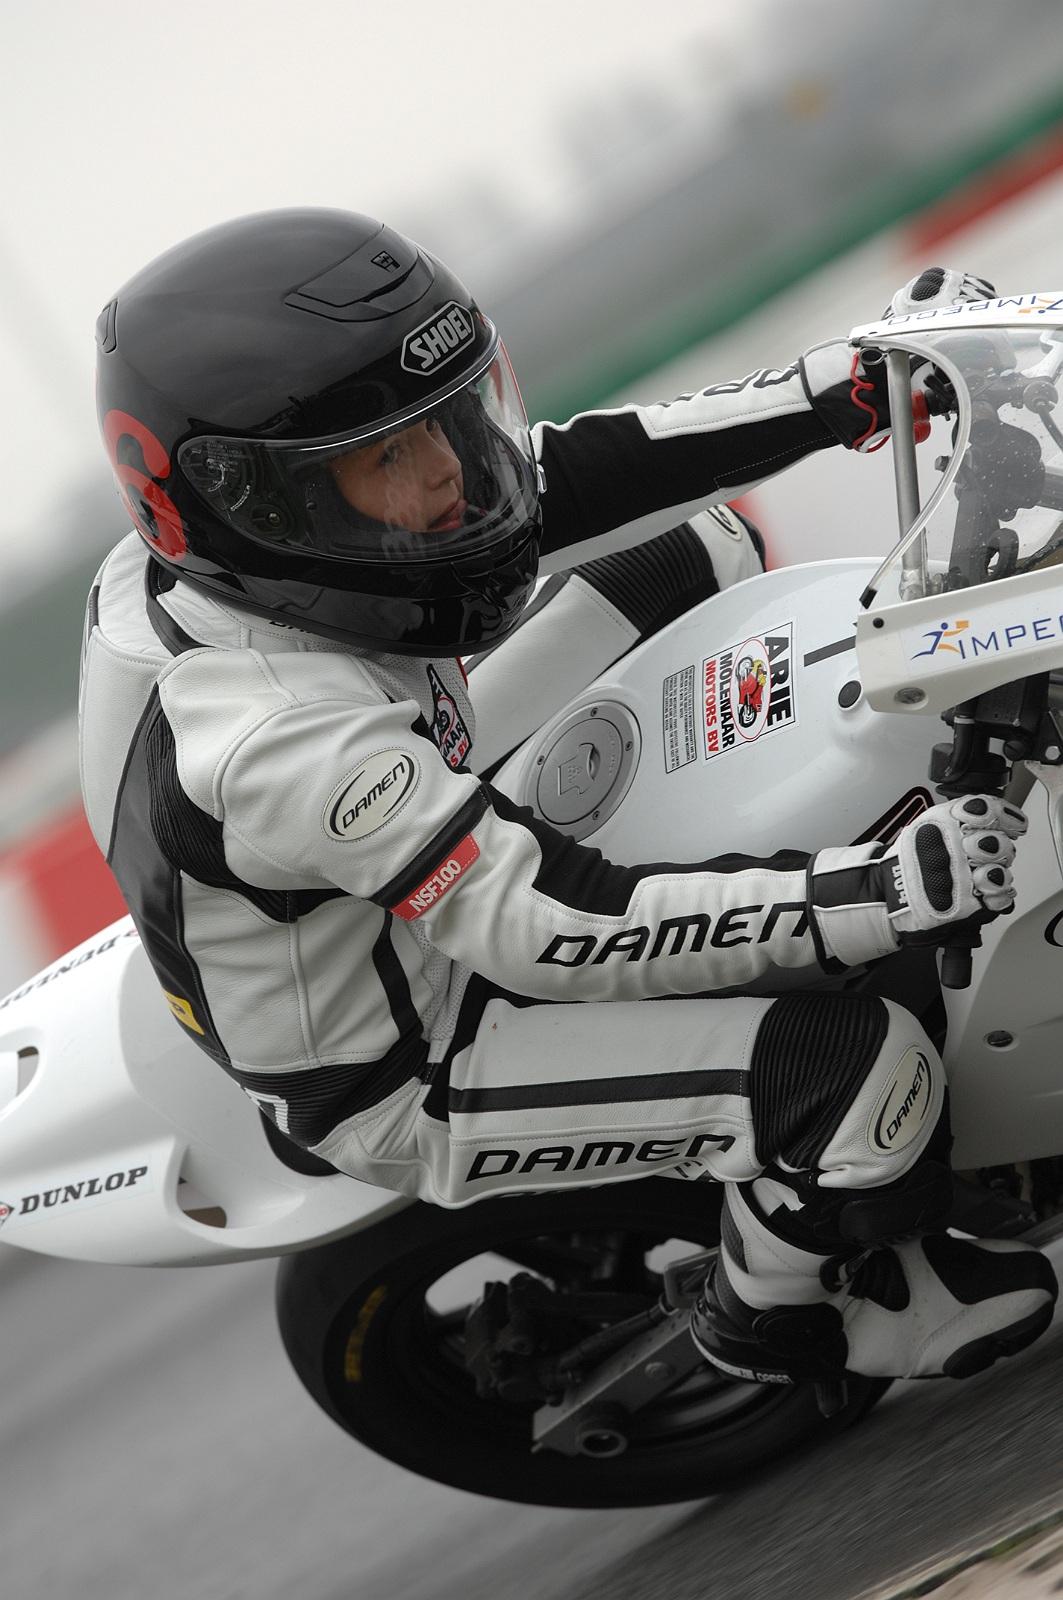 Molenaar NSF 100 Championship